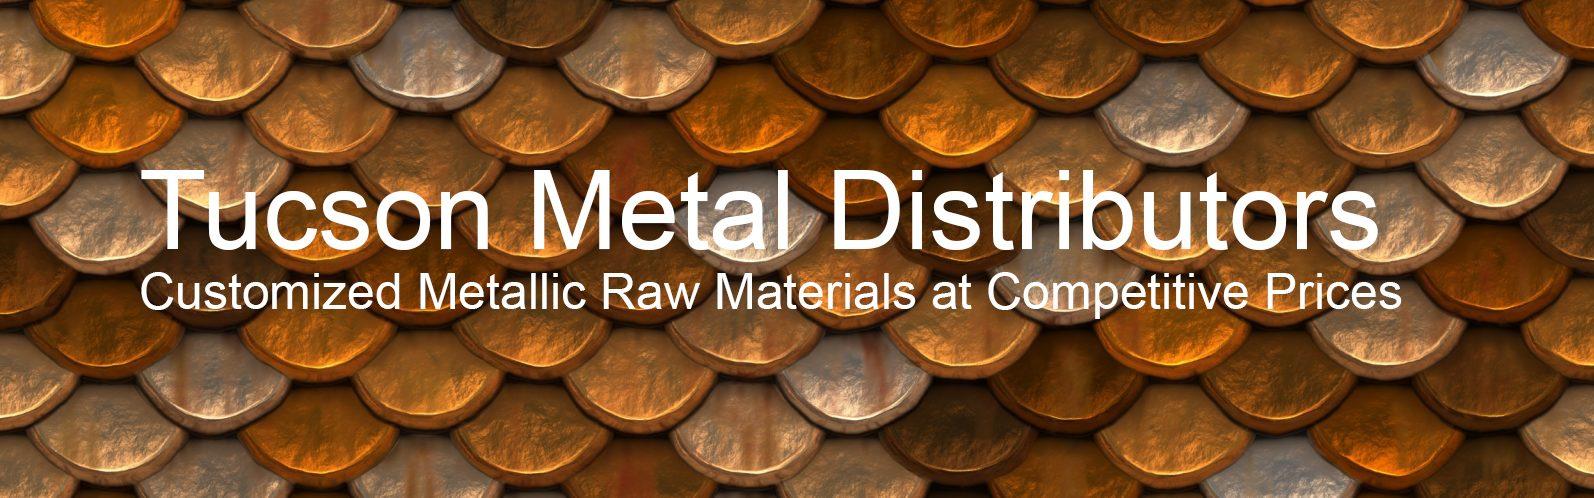 HT Metals